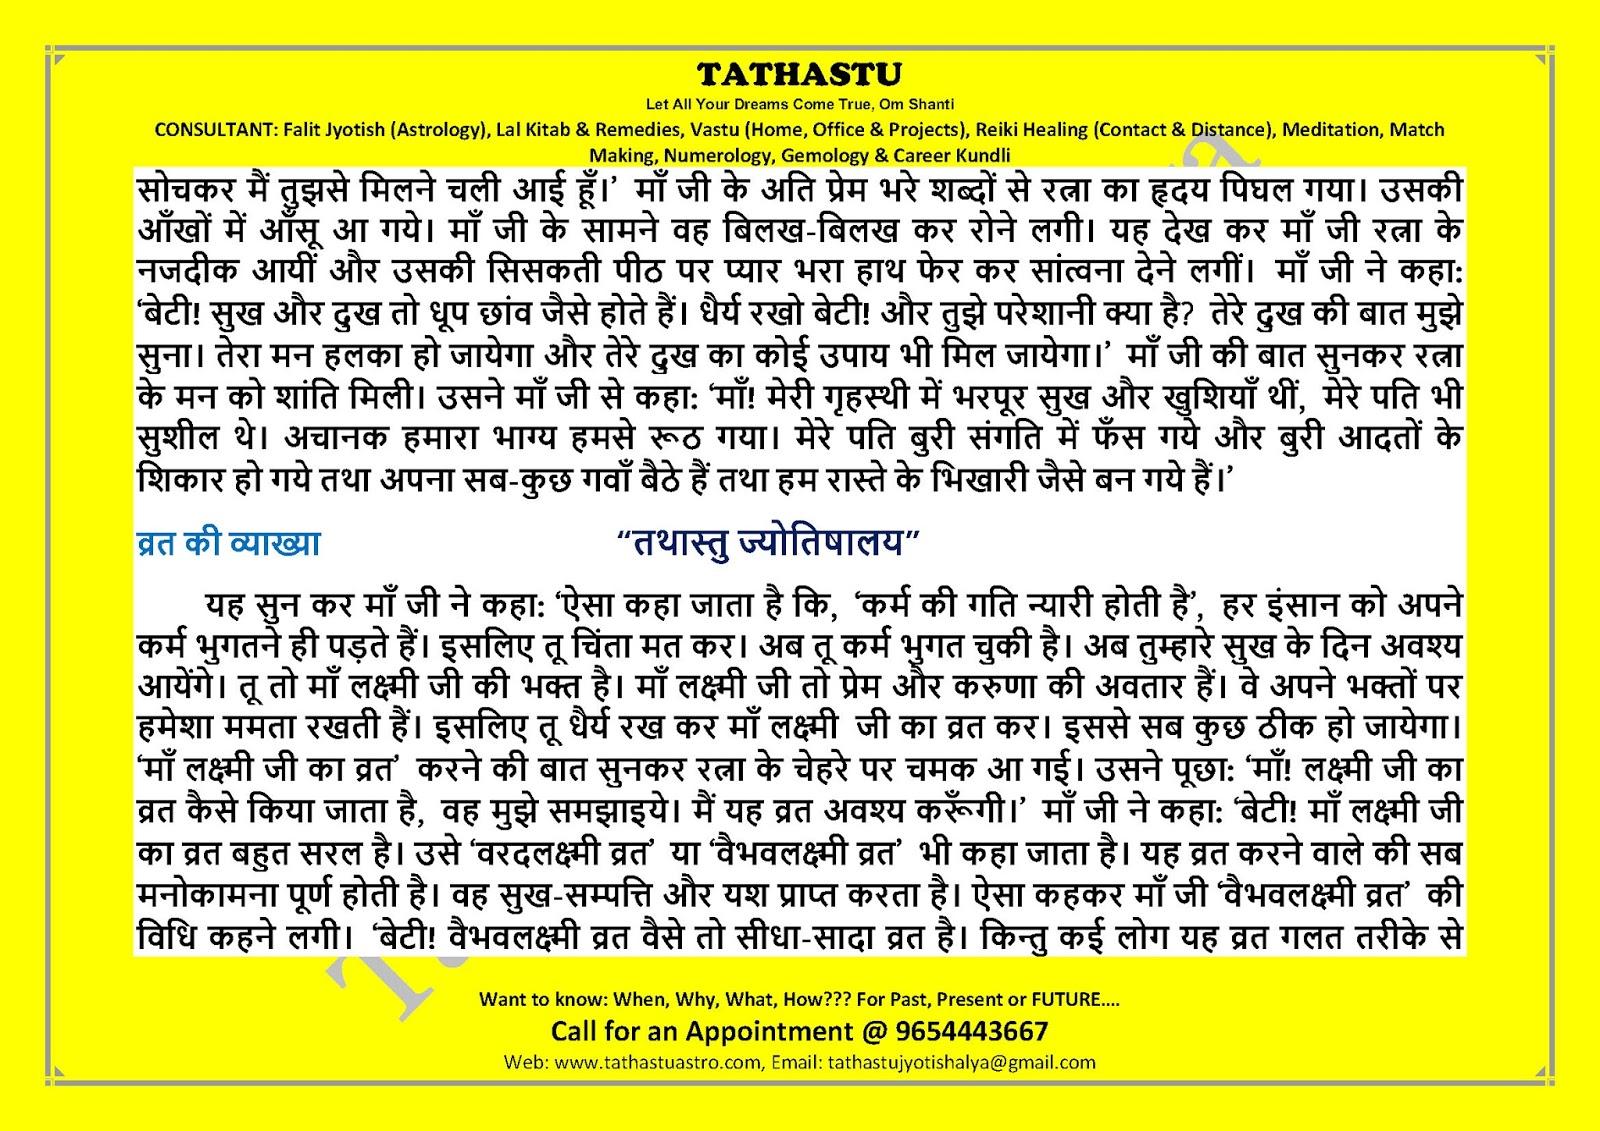 kitab ki atma katha in hindi essay Hindi ki shabda sampada kitab mahal allahabad, up bhasha vigyan ki bhoomika, devendranath sharma swaroop, siddhant ki aavshyakatha ki atma.